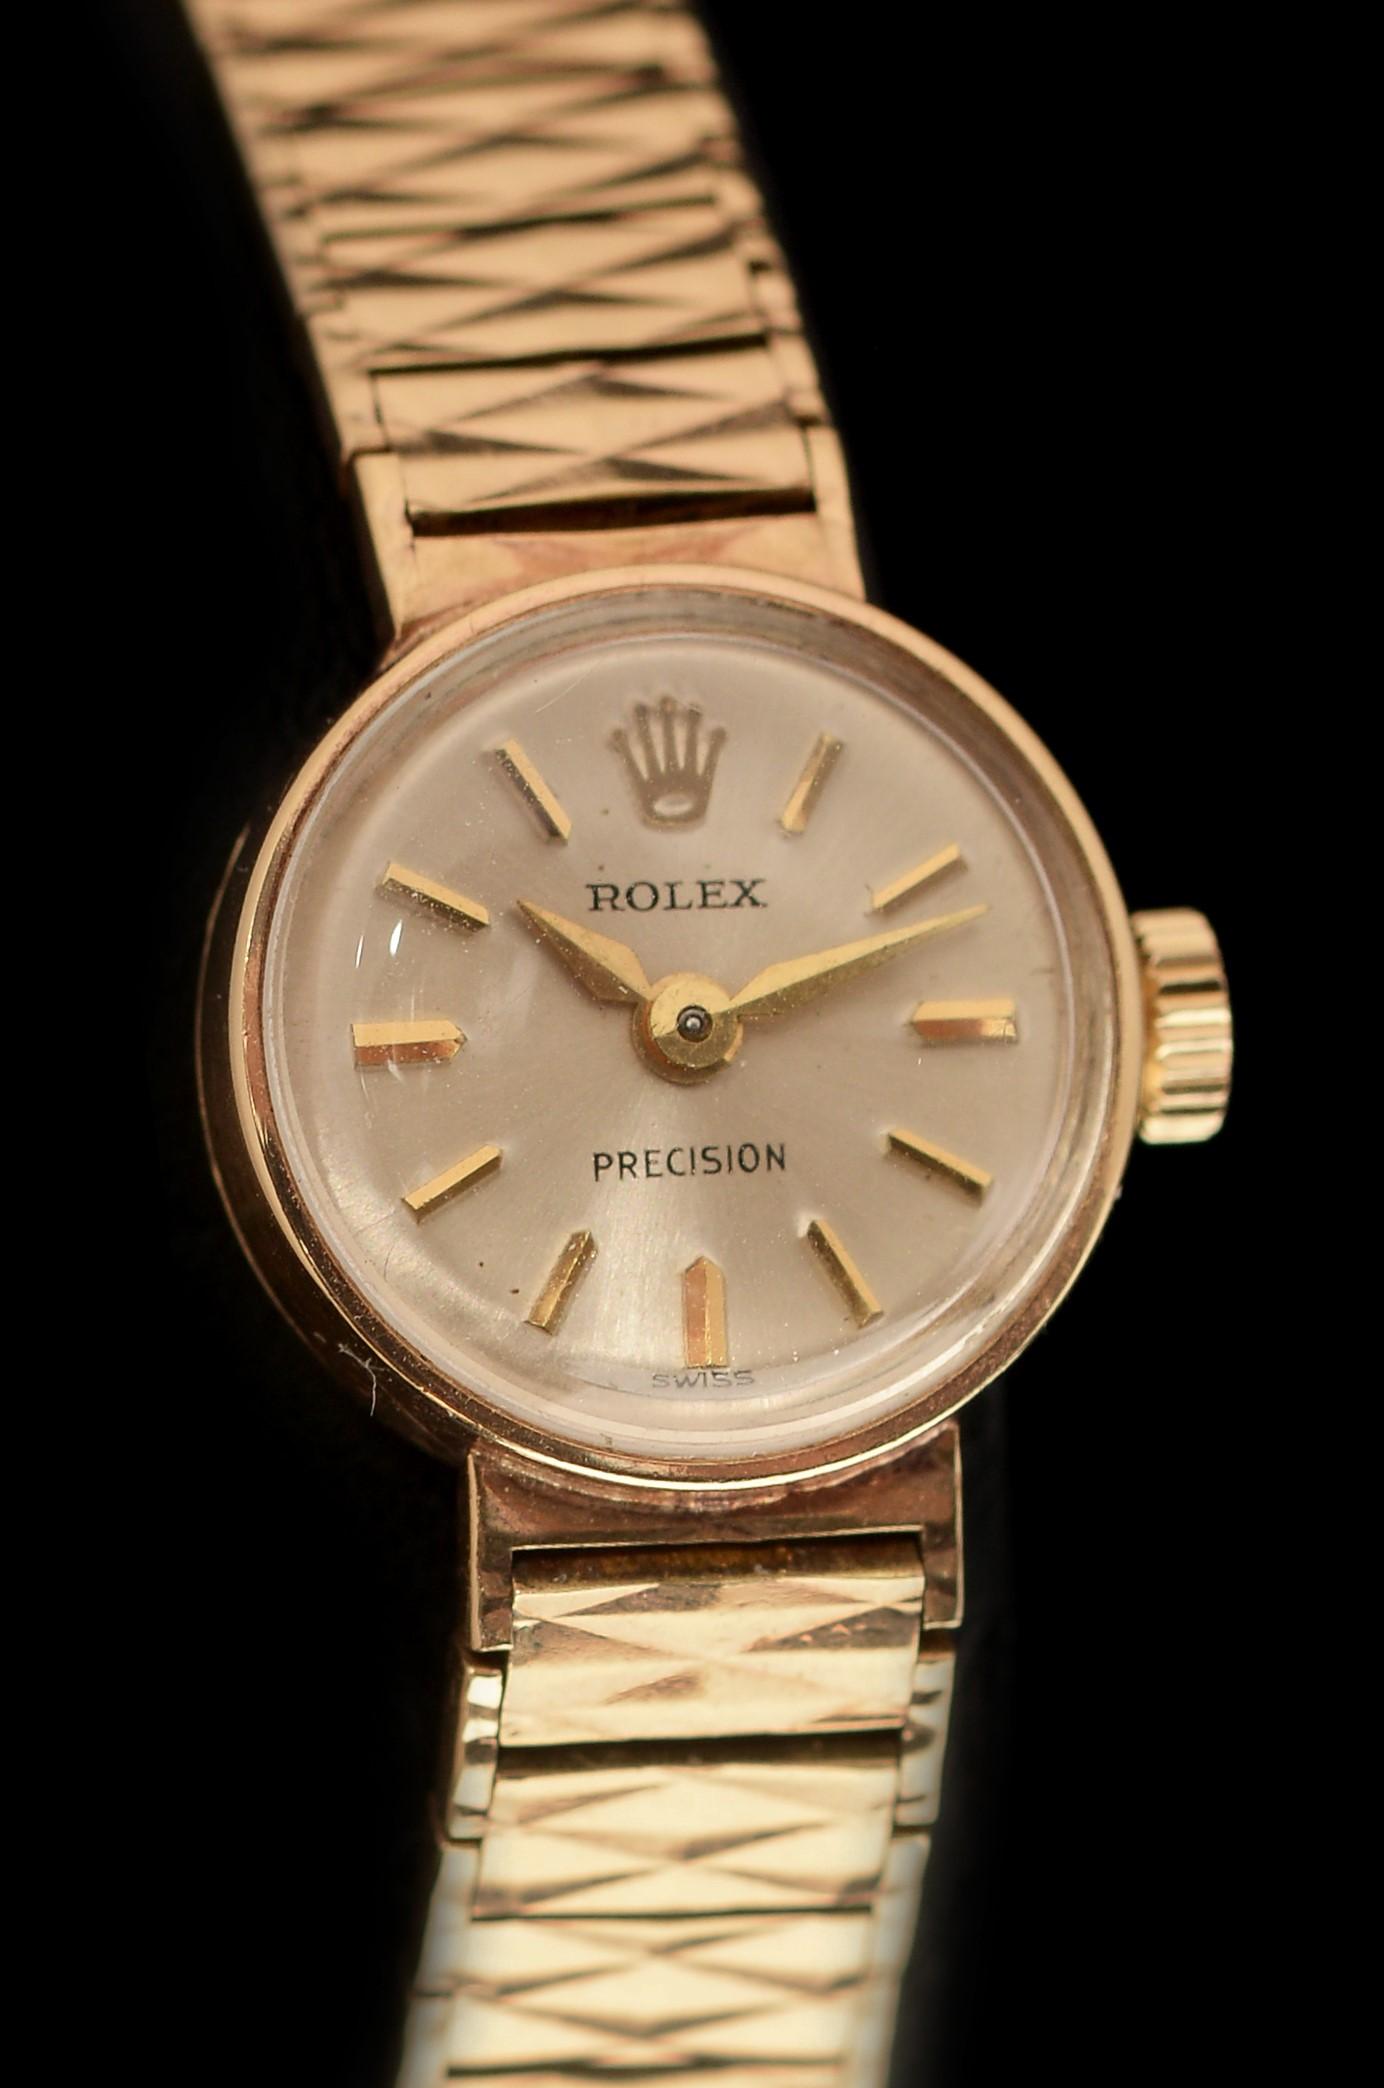 Lot 20 - 9k gold Lady's Rolex Precision cocktail watch